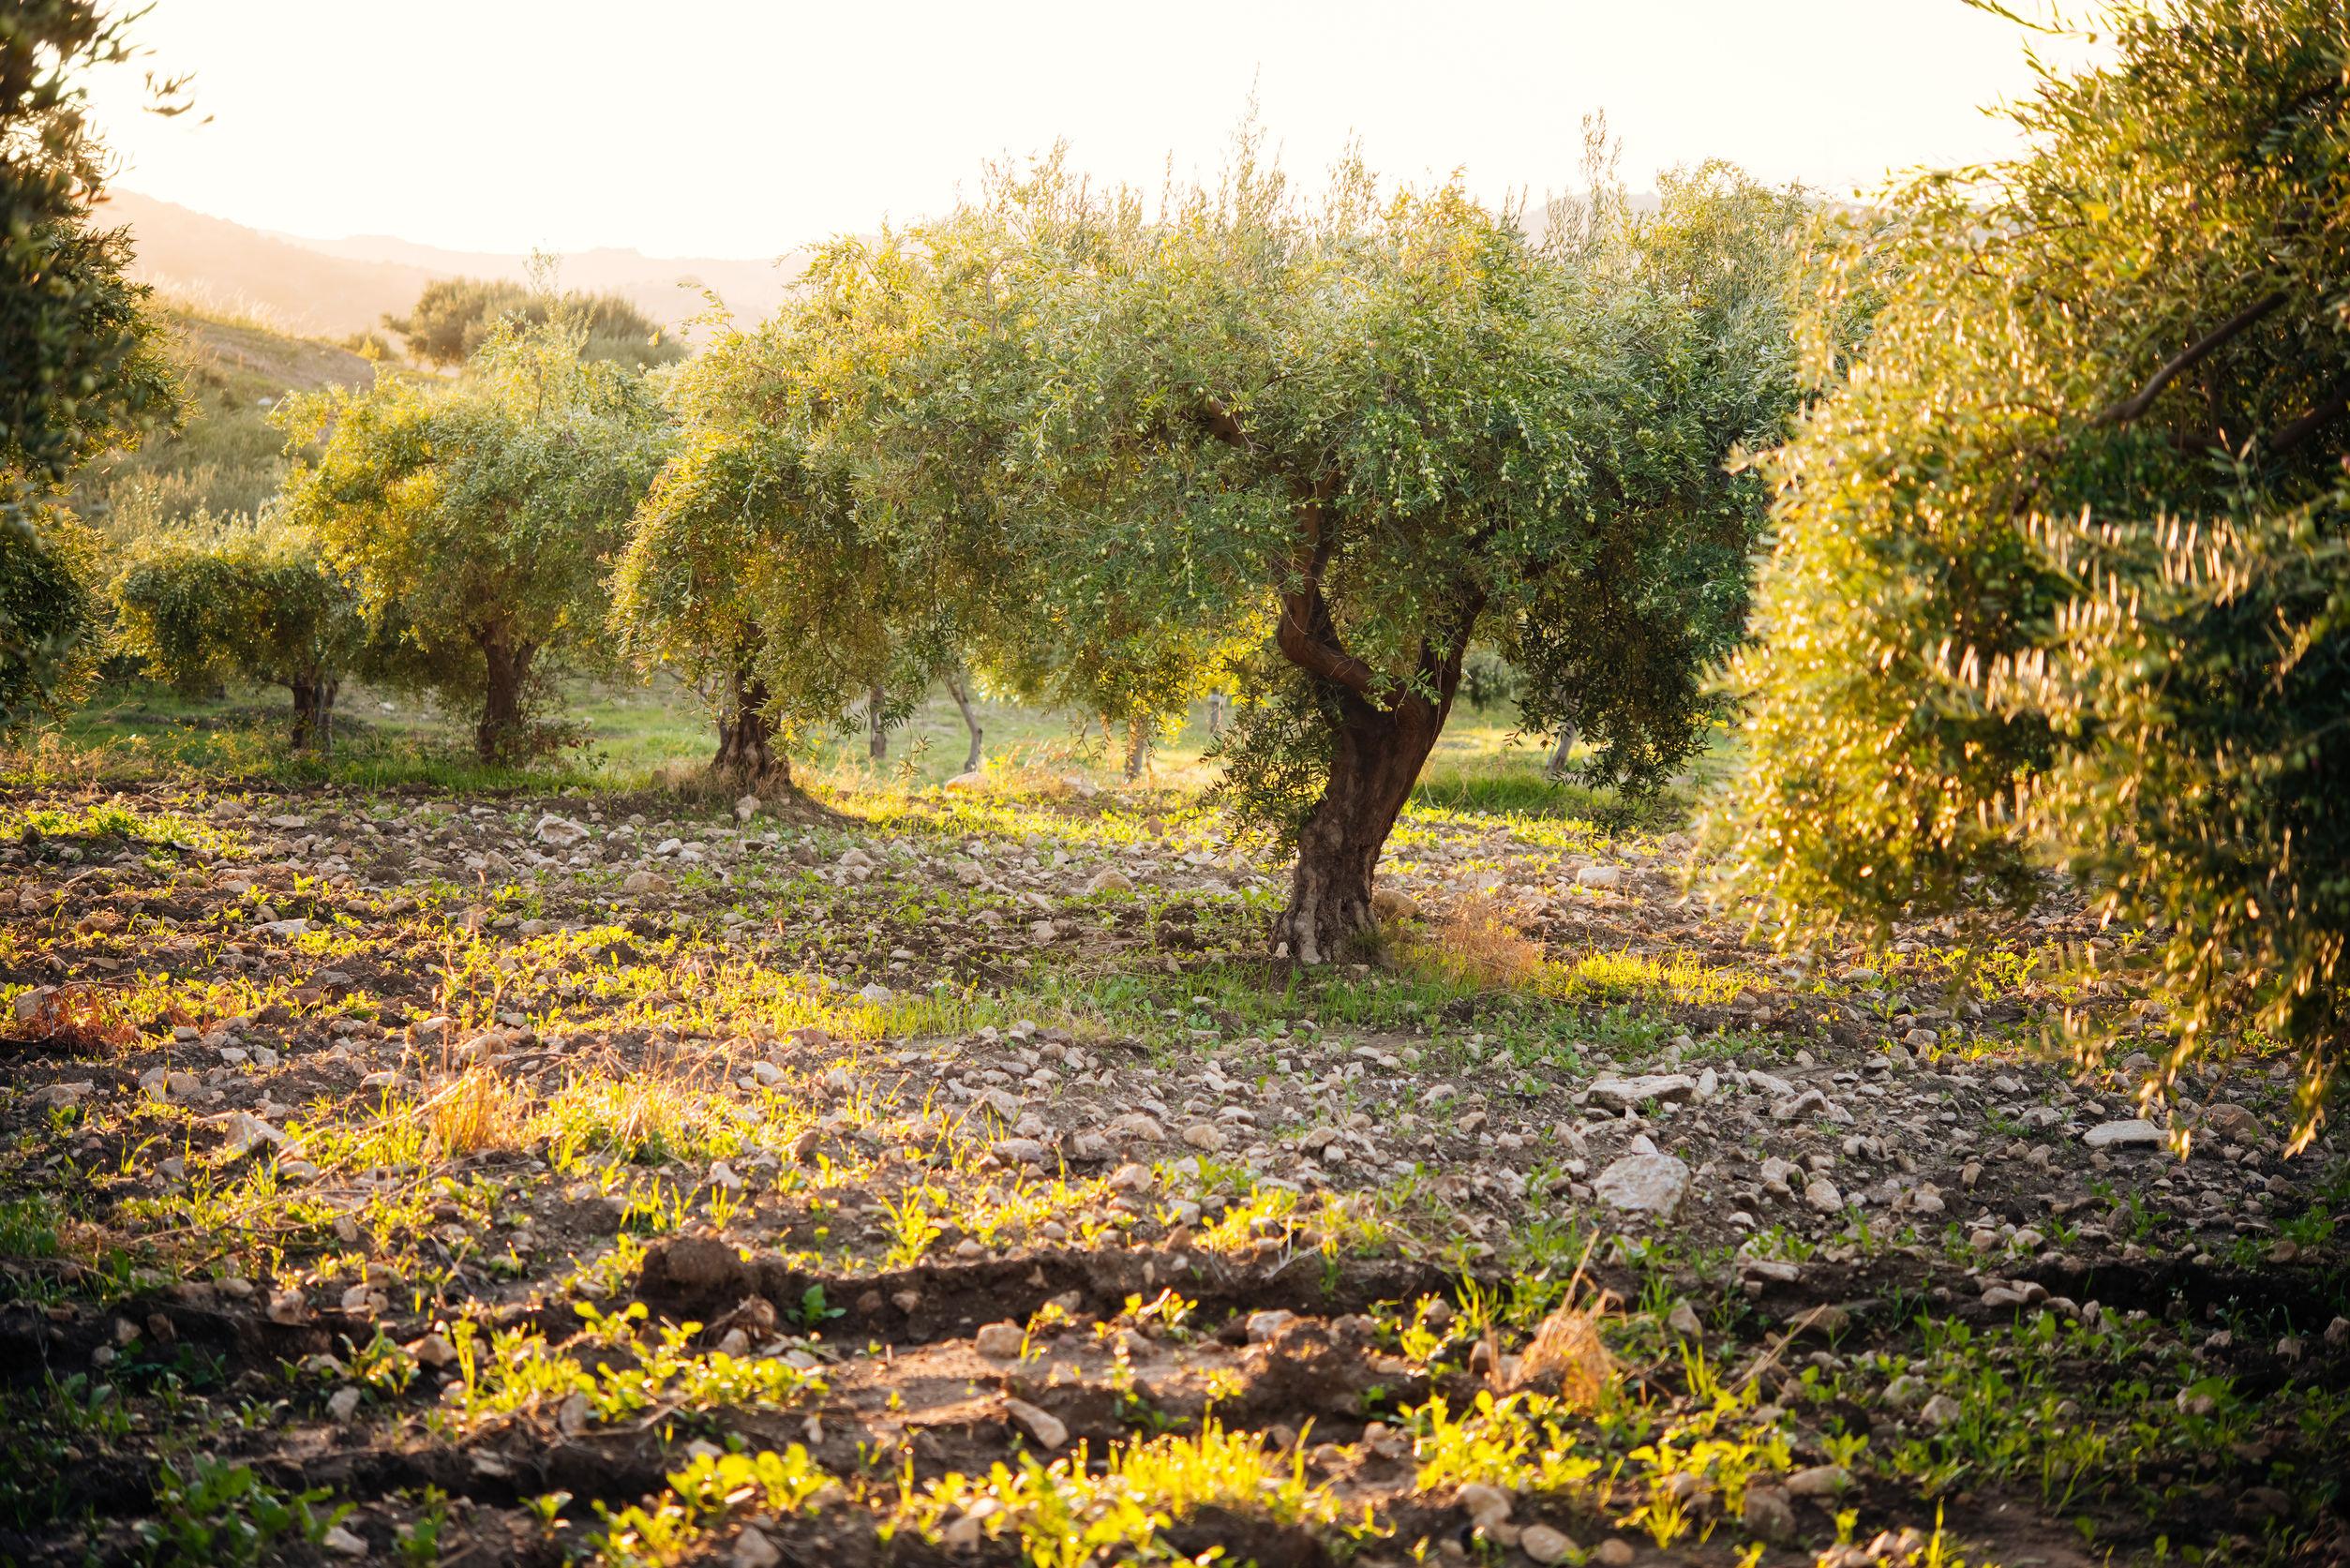 50539724 - harvesting olives in sicily village, italy